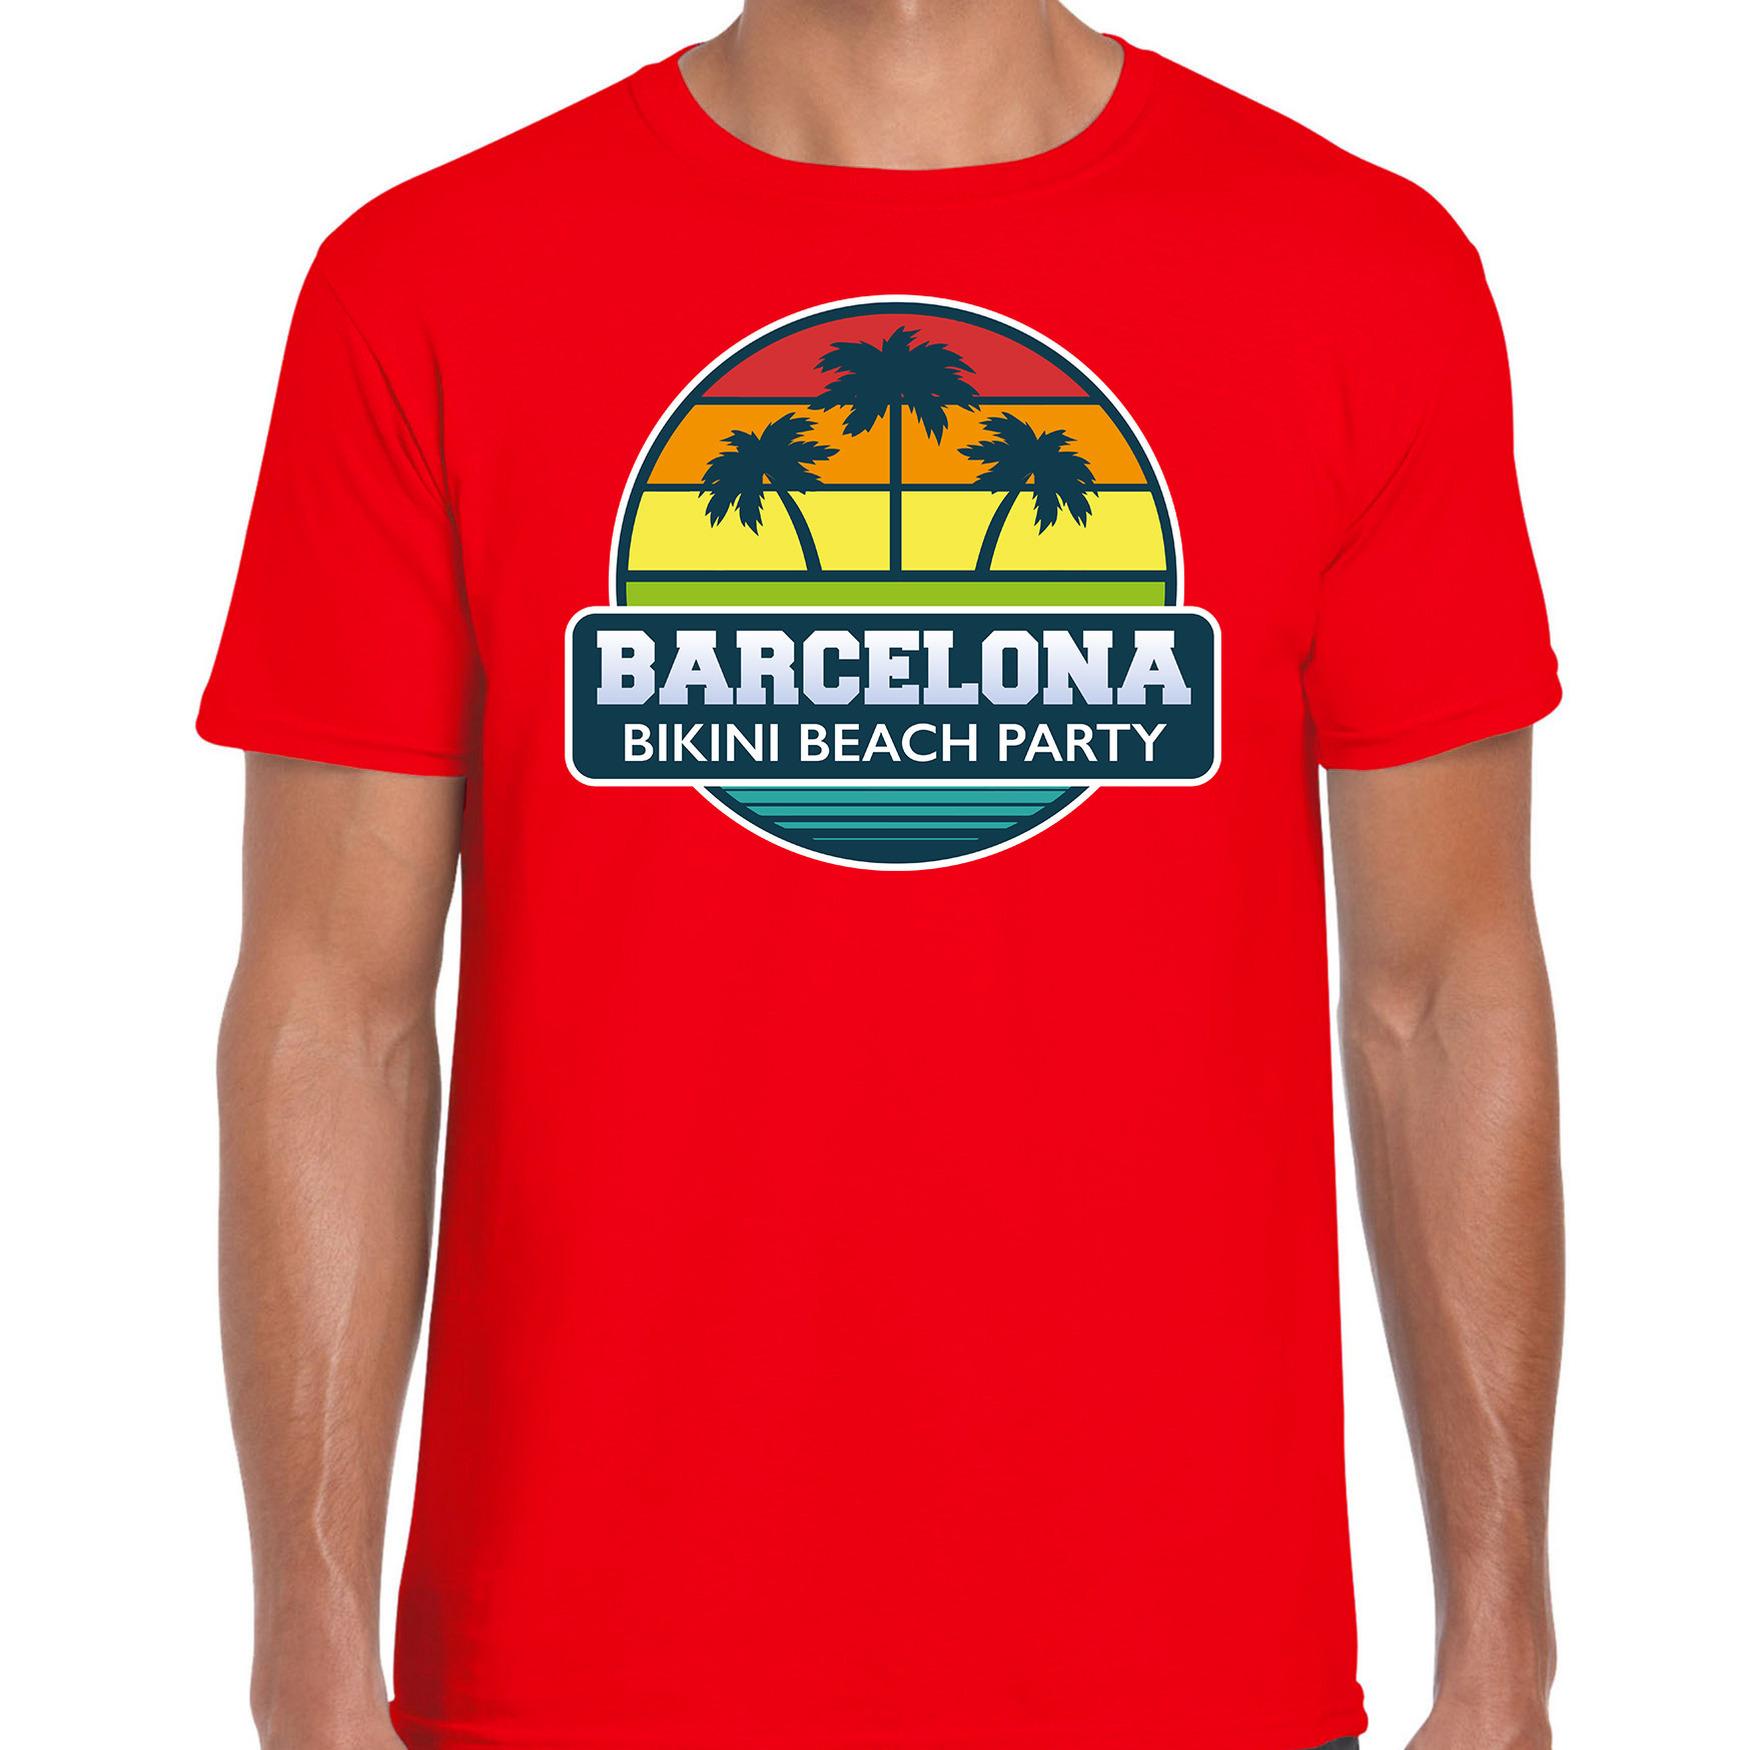 Barcelona zomer t-shirt / shirt Barcelona bikini beach party rood voor heren